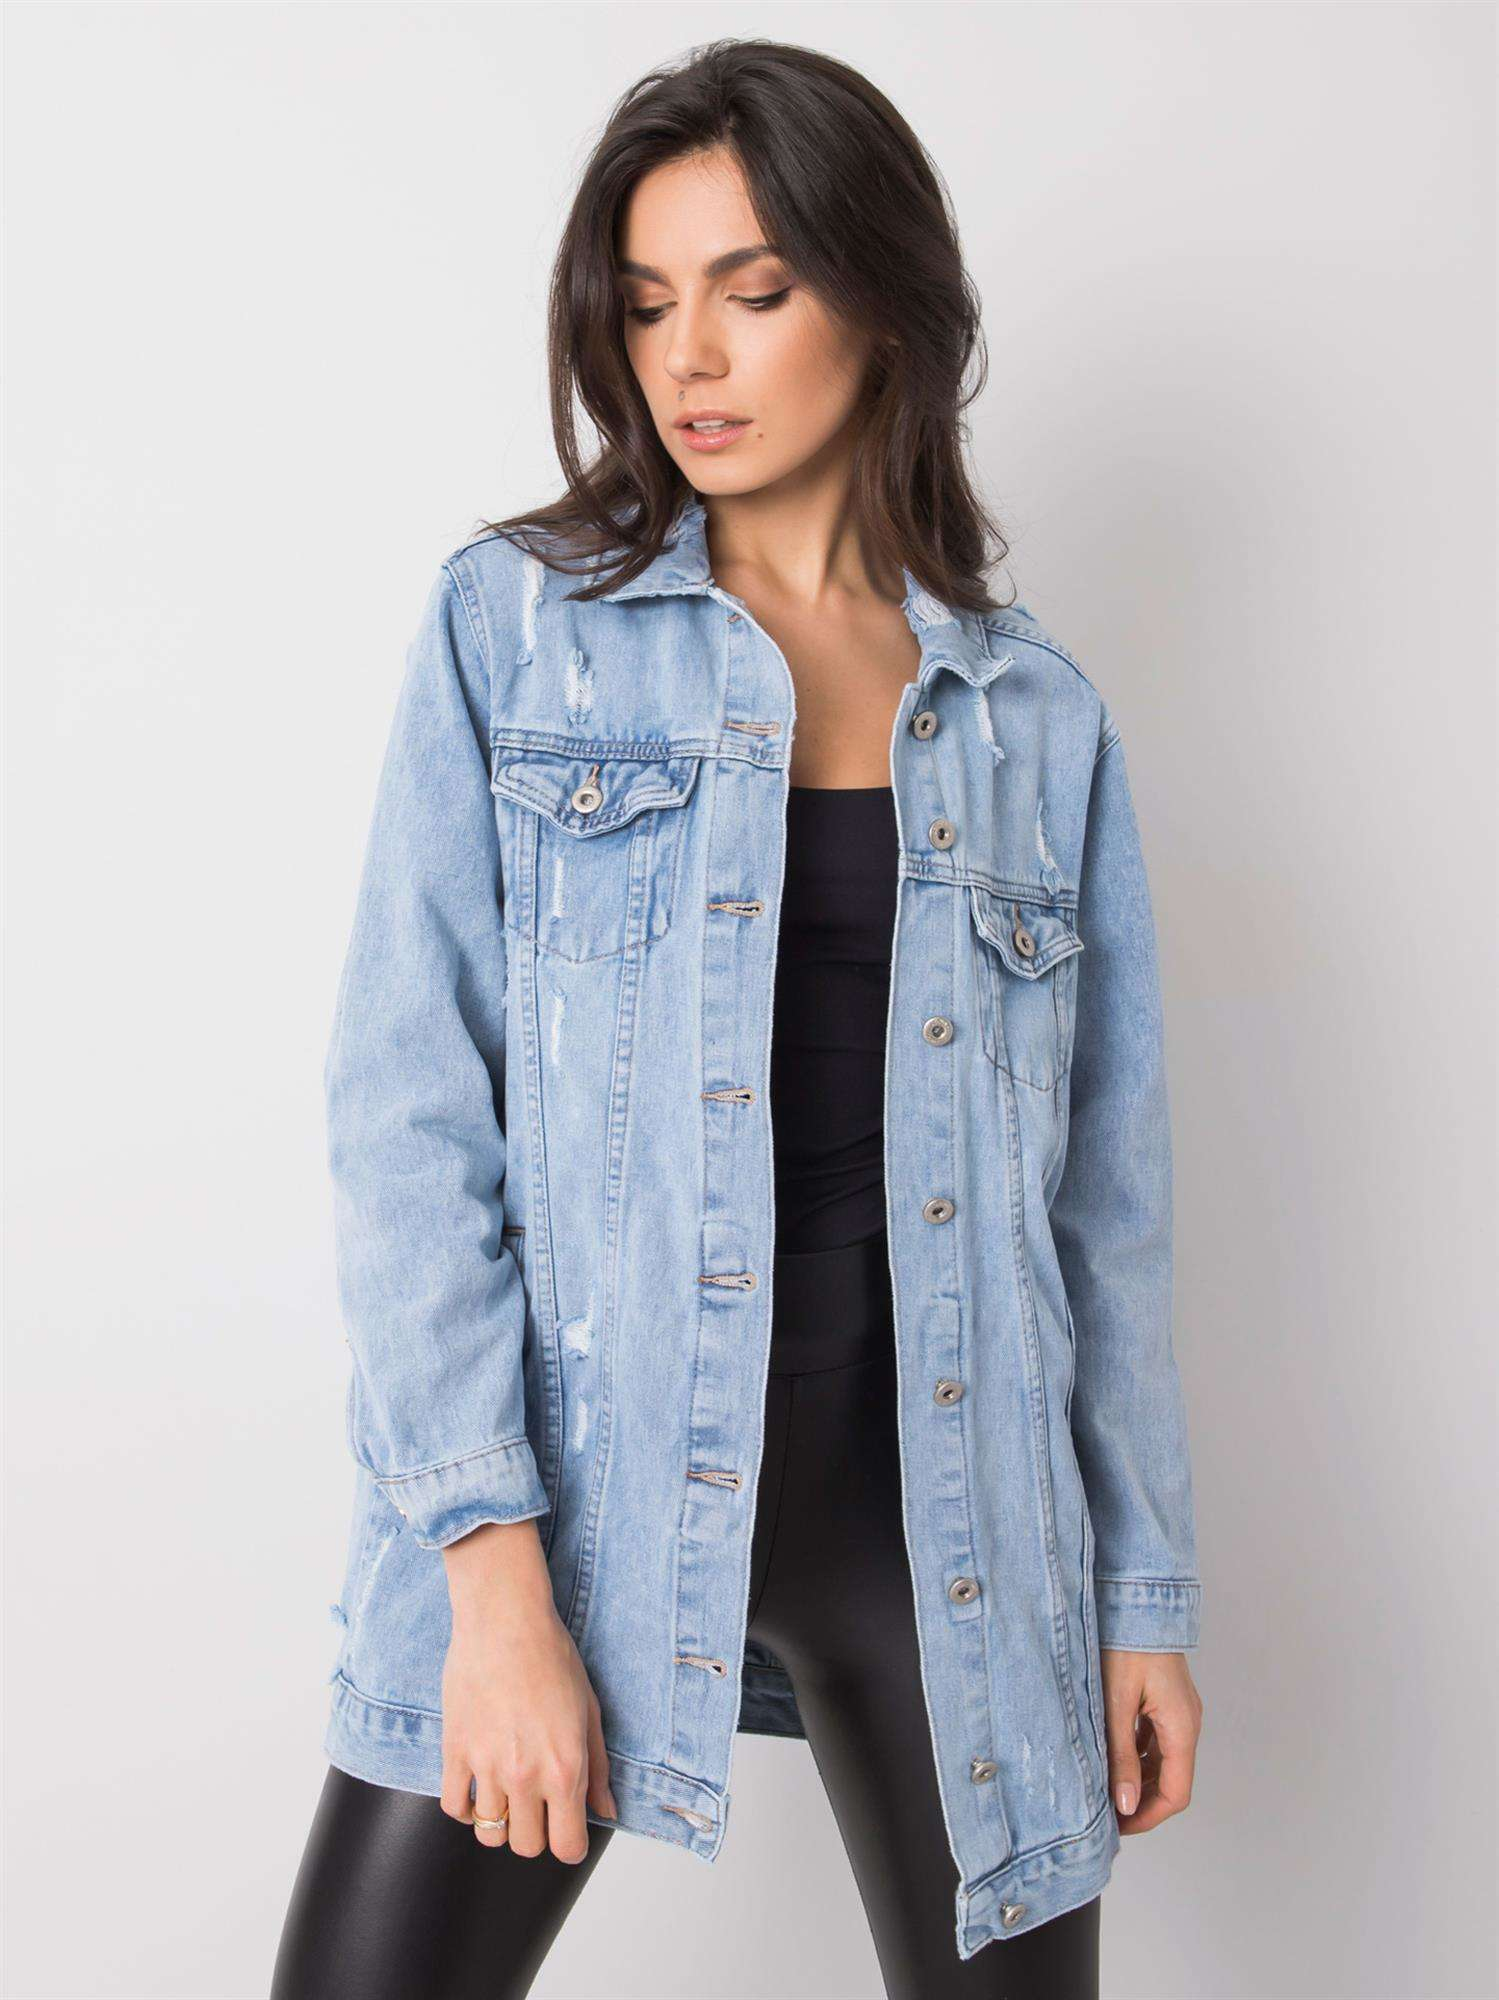 Dámska modrá džínsová bunda M / L